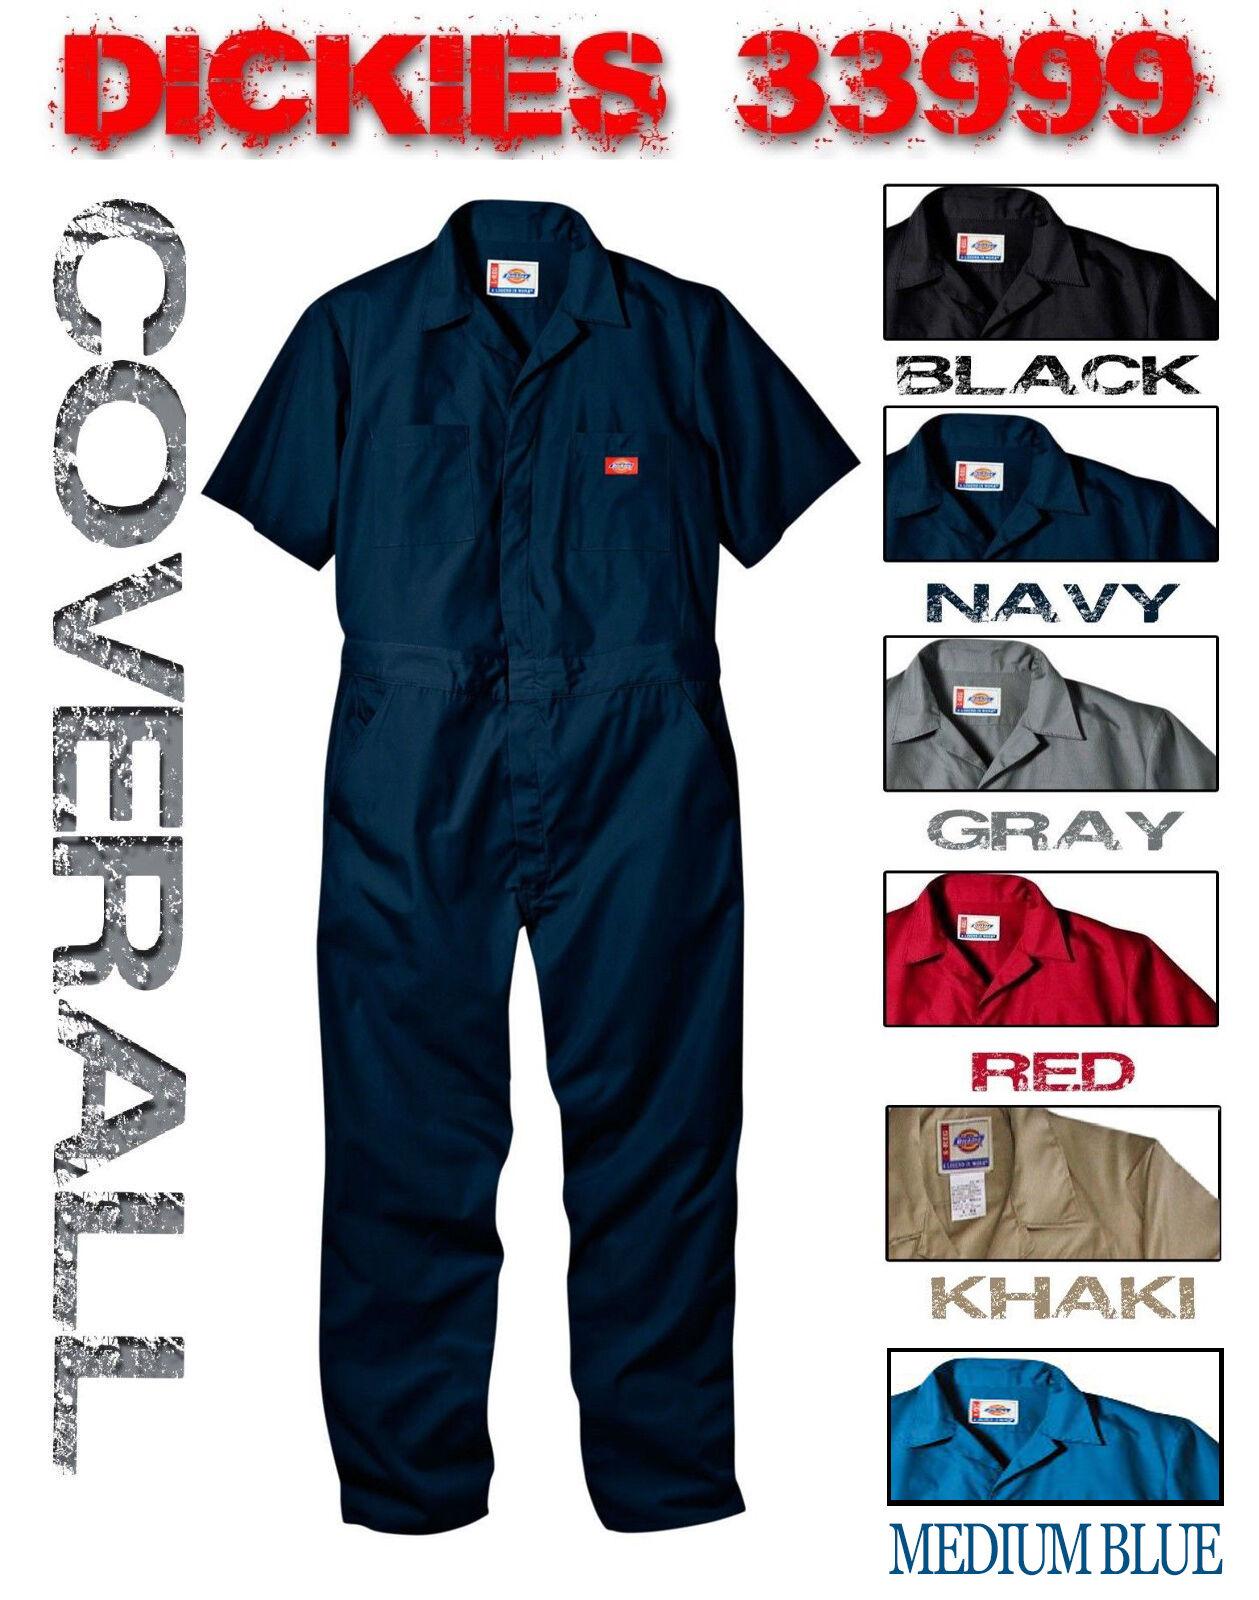 NEW DICKIES 33999 COVERALLS SHORT SLEEVE MENS BLACK NAVY GREY RED KHAKI